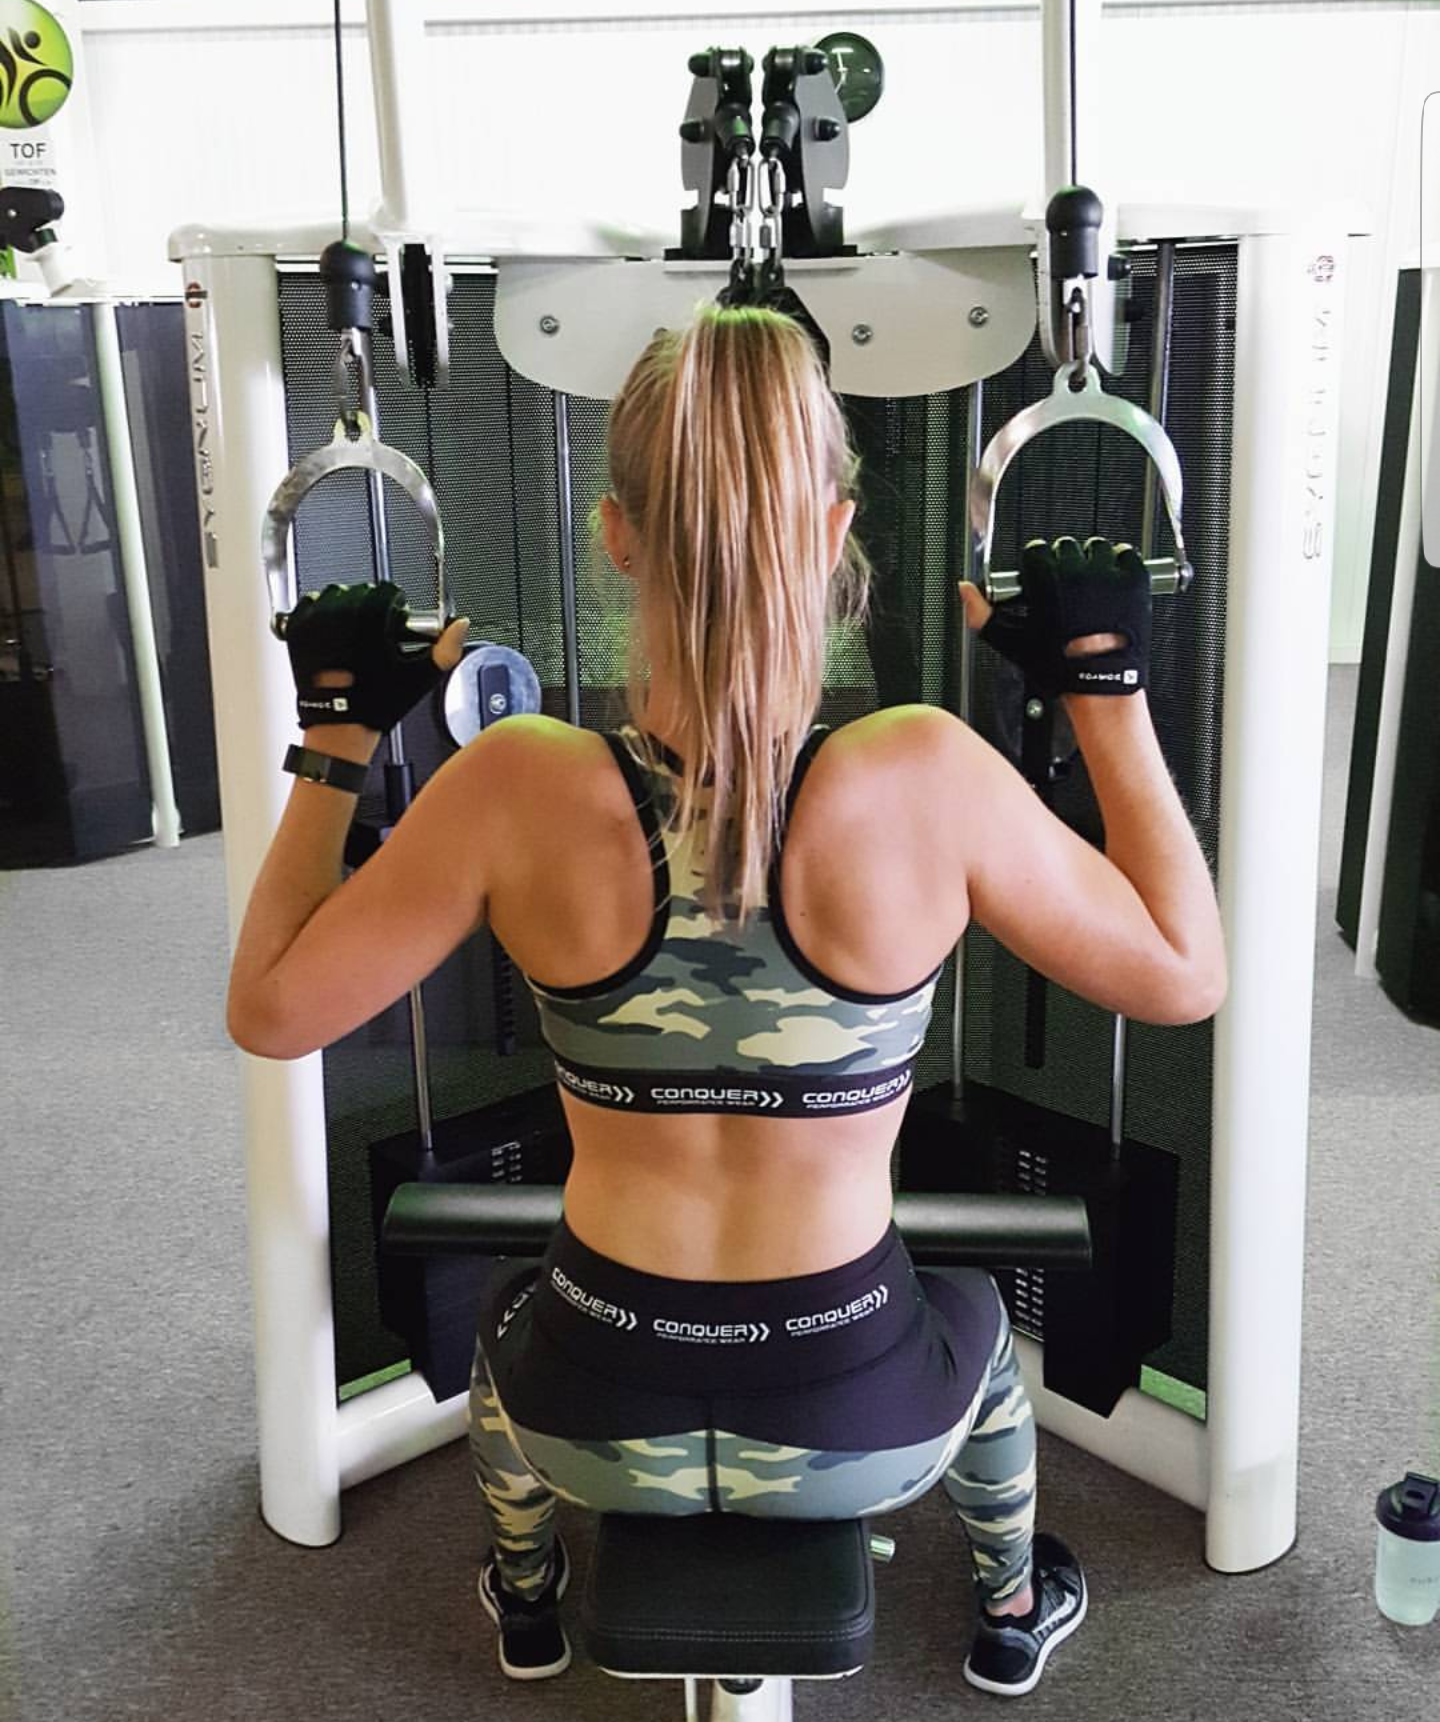 afvallen, gymjunkie lifestyle plan, vet verliezen, gymjunkie van de maand